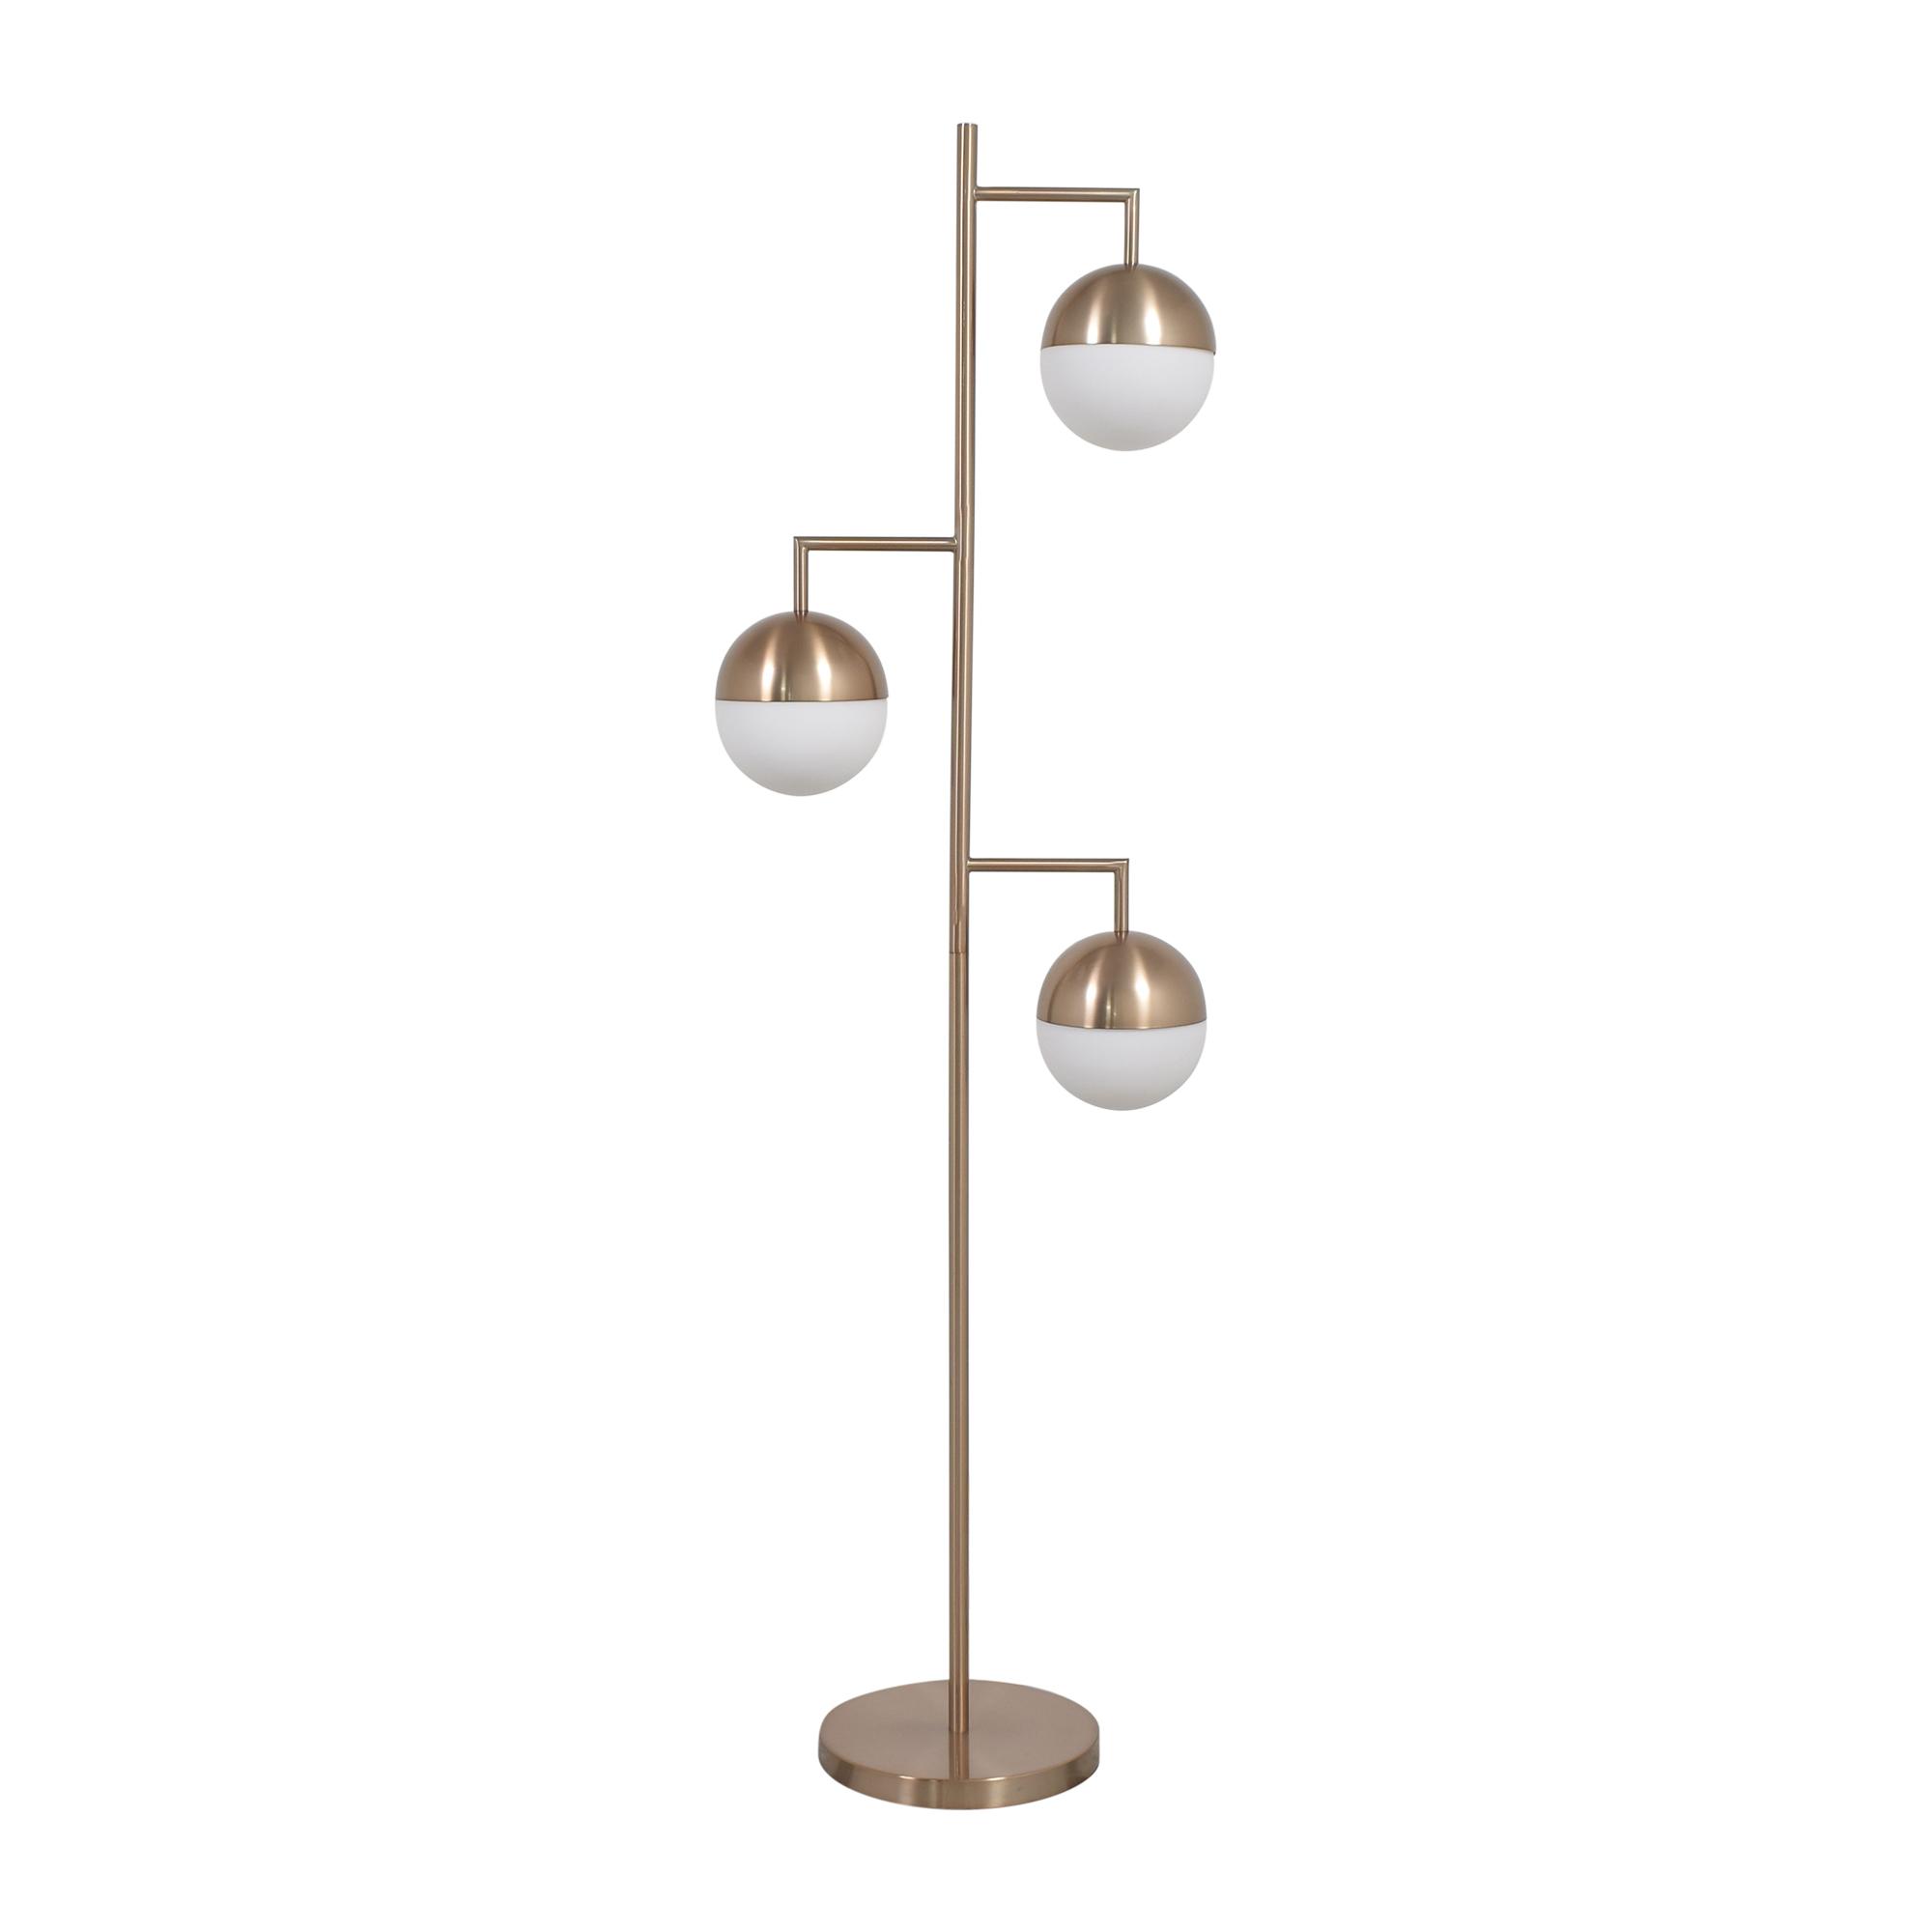 CB2 CB2 Orbs Floor Lamp Lamps